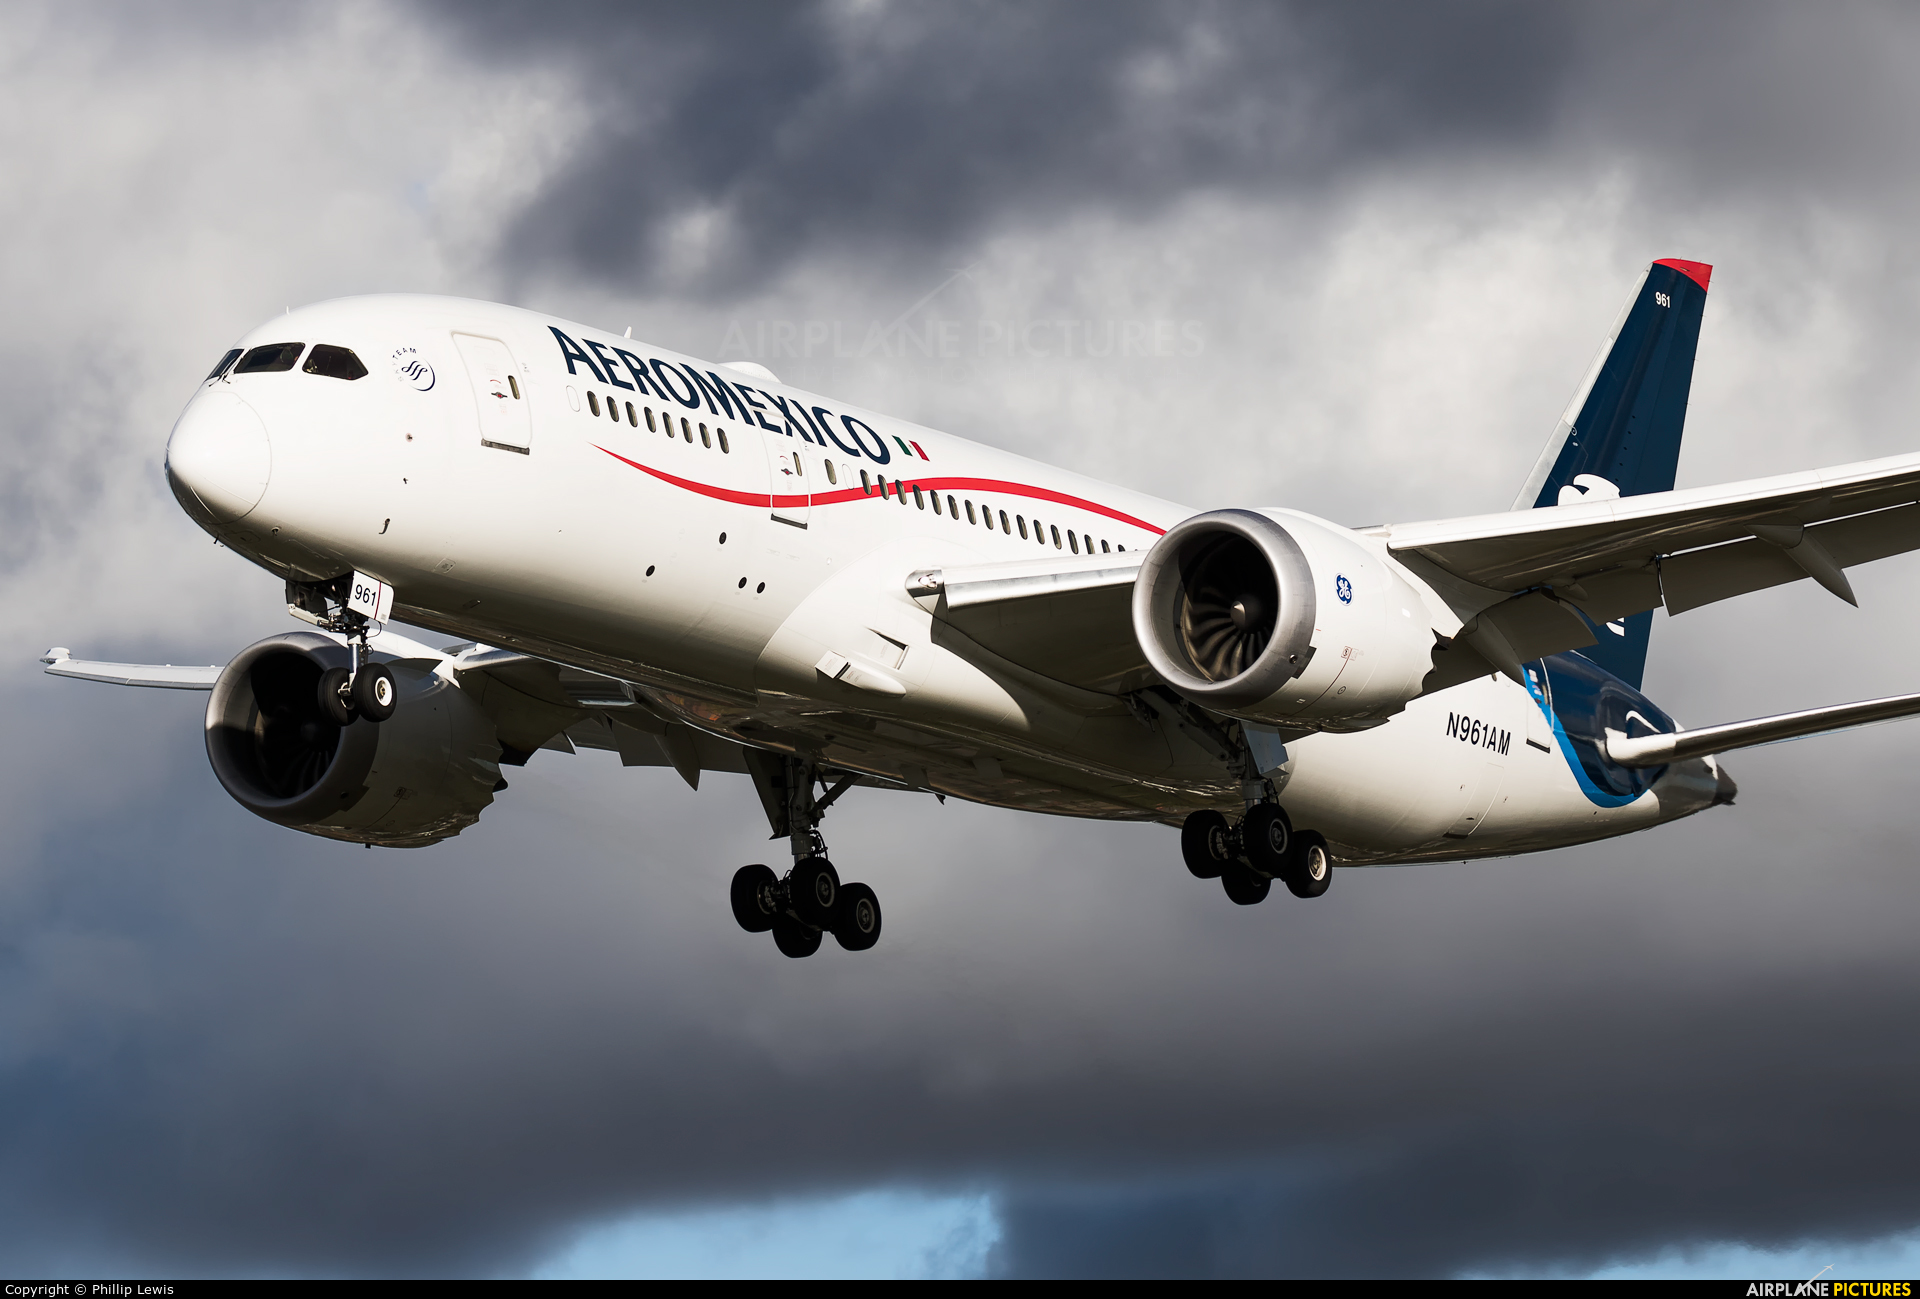 Aeromexico N961AM aircraft at London - Heathrow